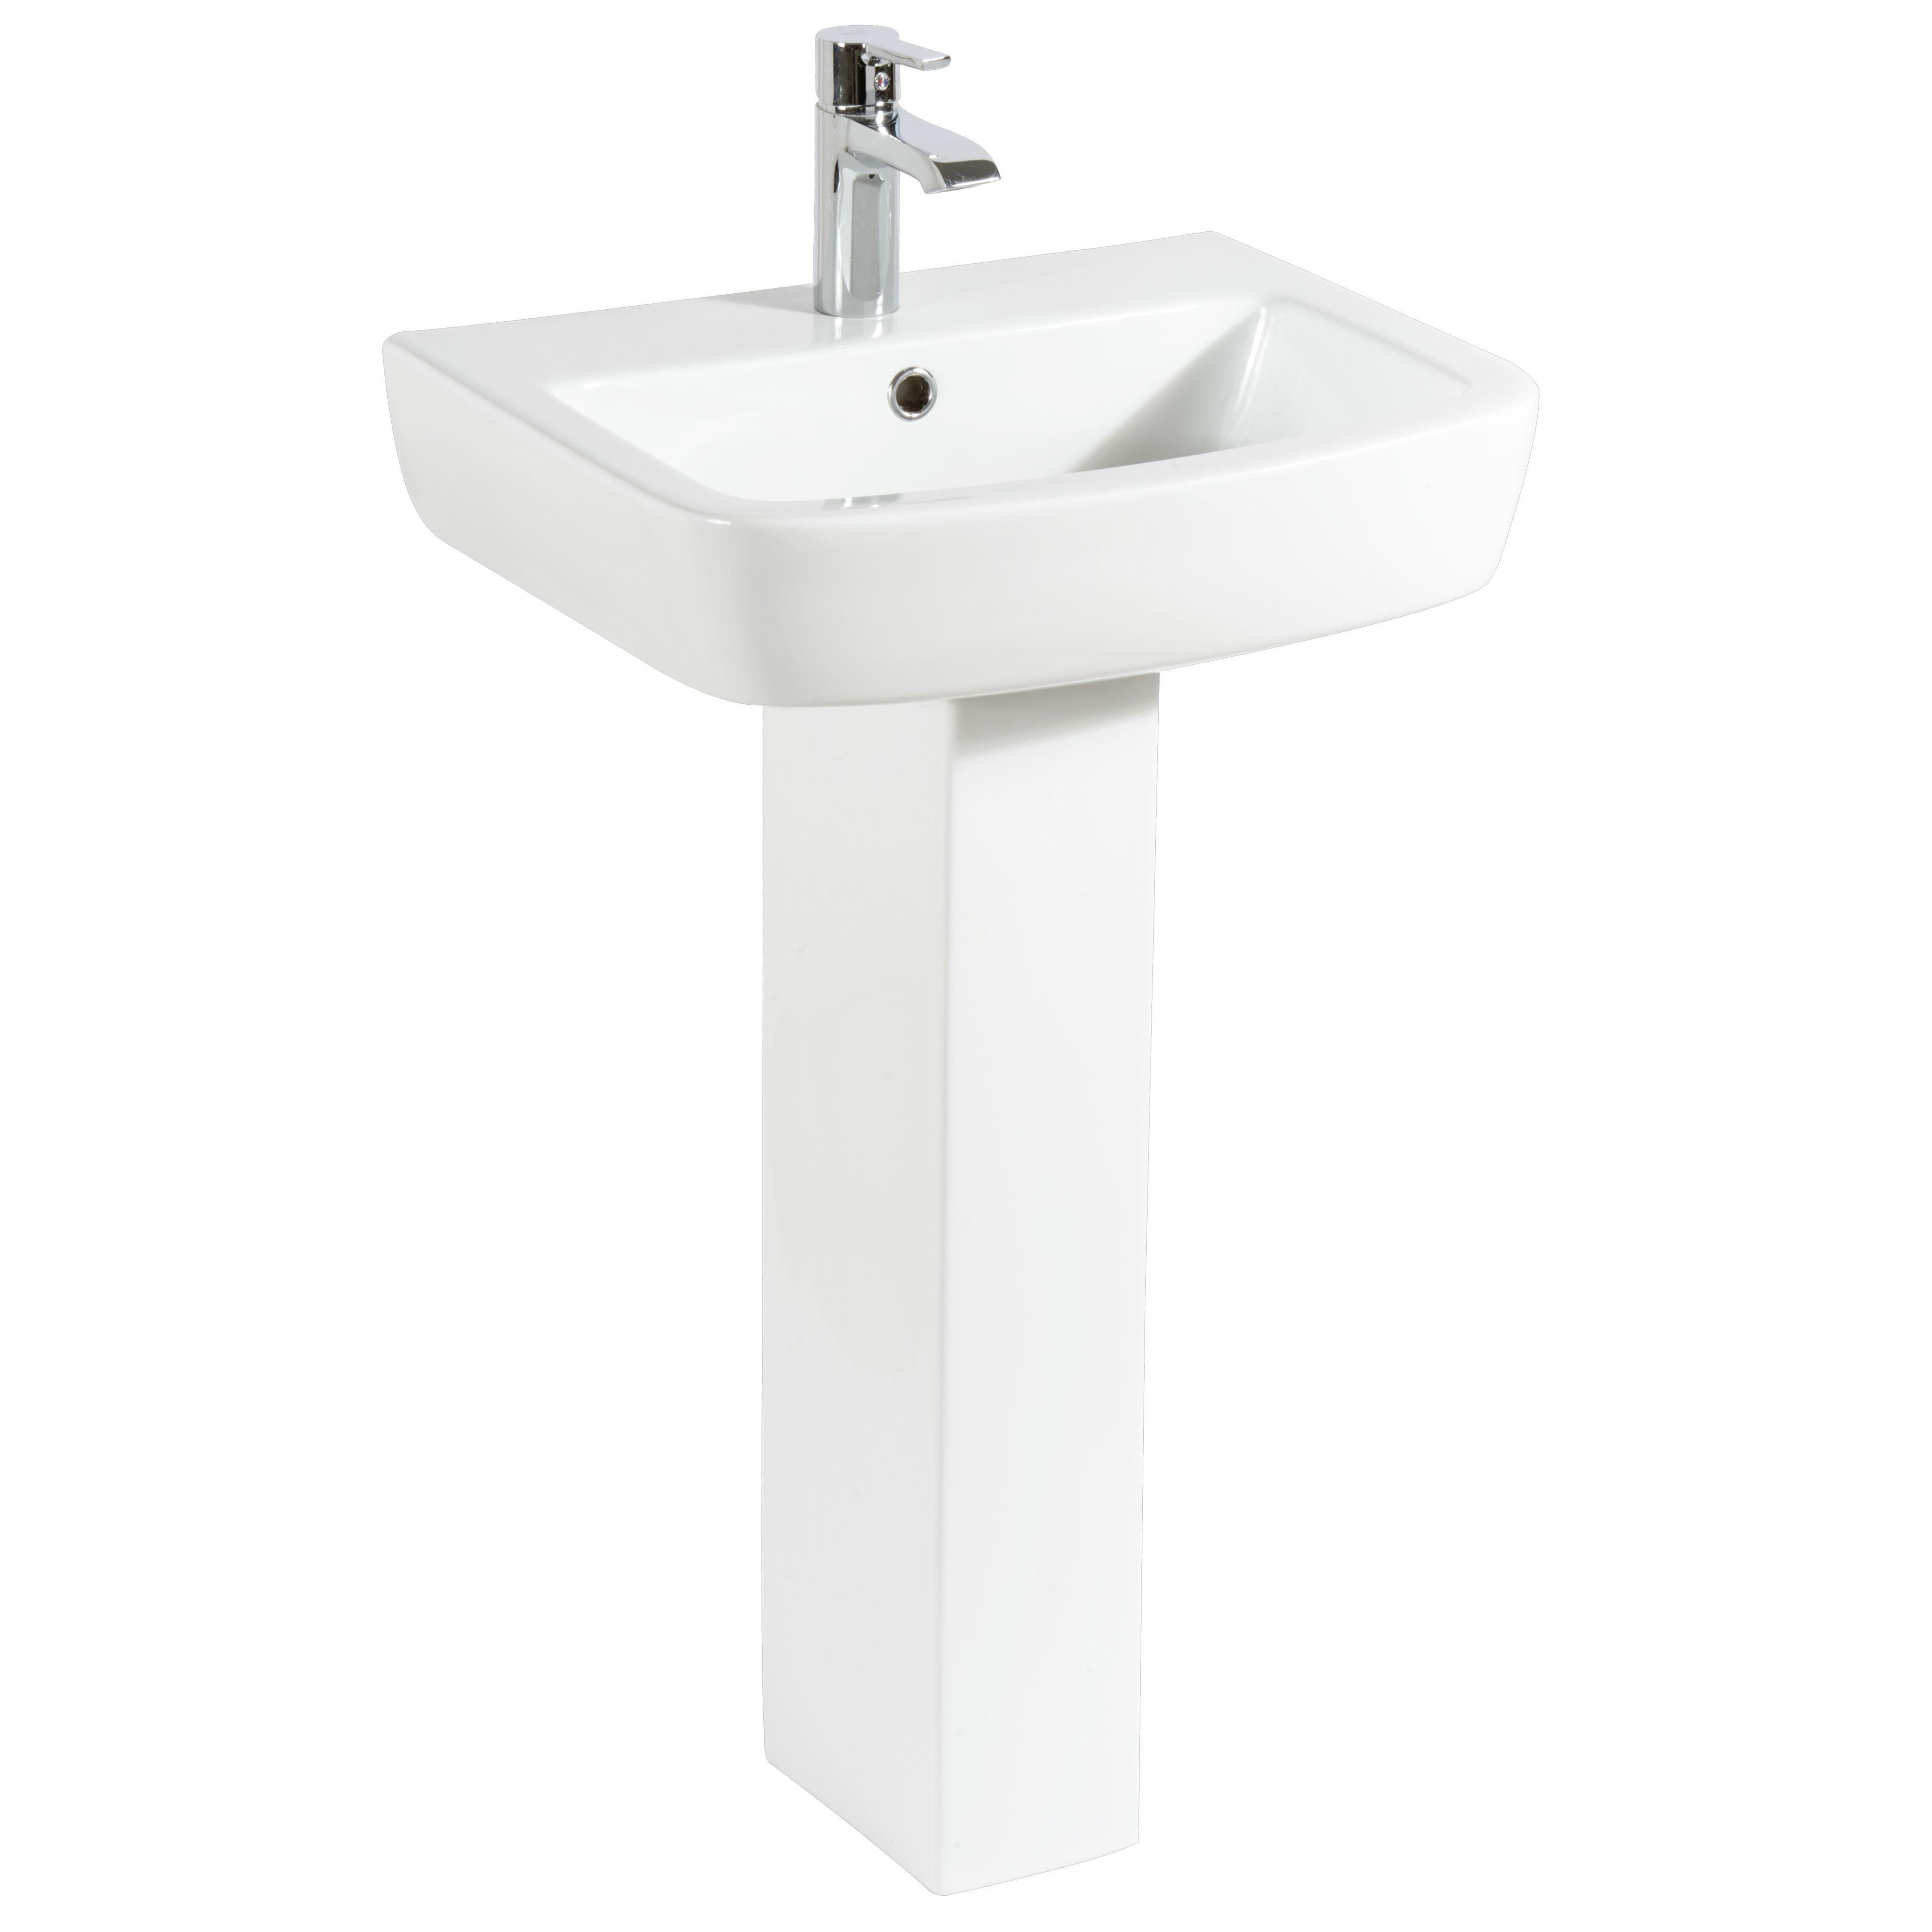 Bathroom Sinks B&Q Ireland cooke & lewis fabienne rectangular full pedestal basin